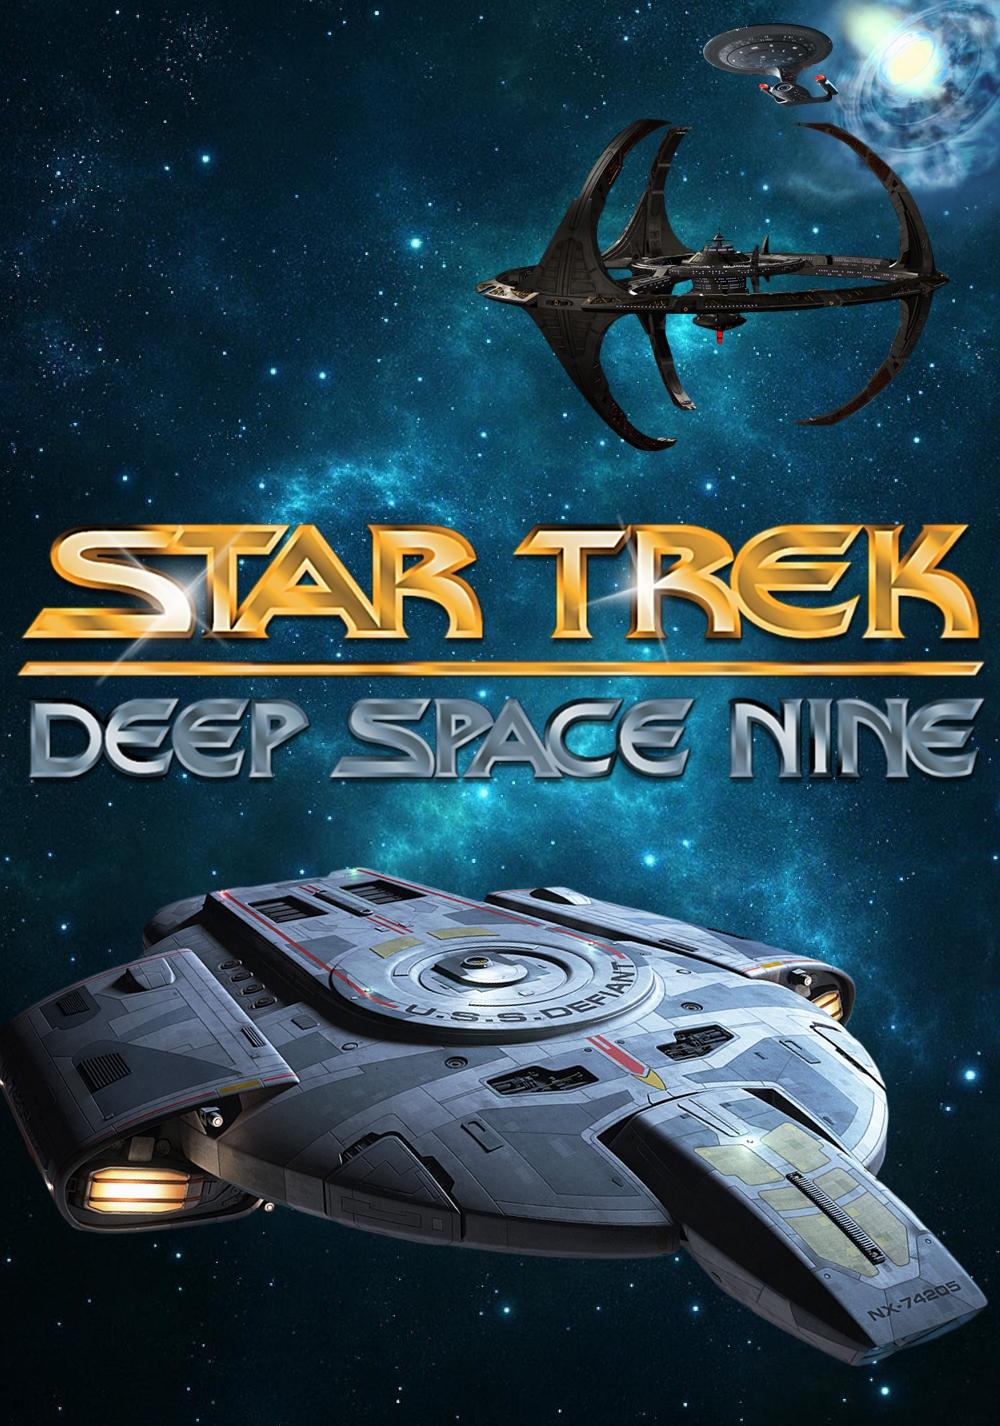 Star Trek Deep Space 9